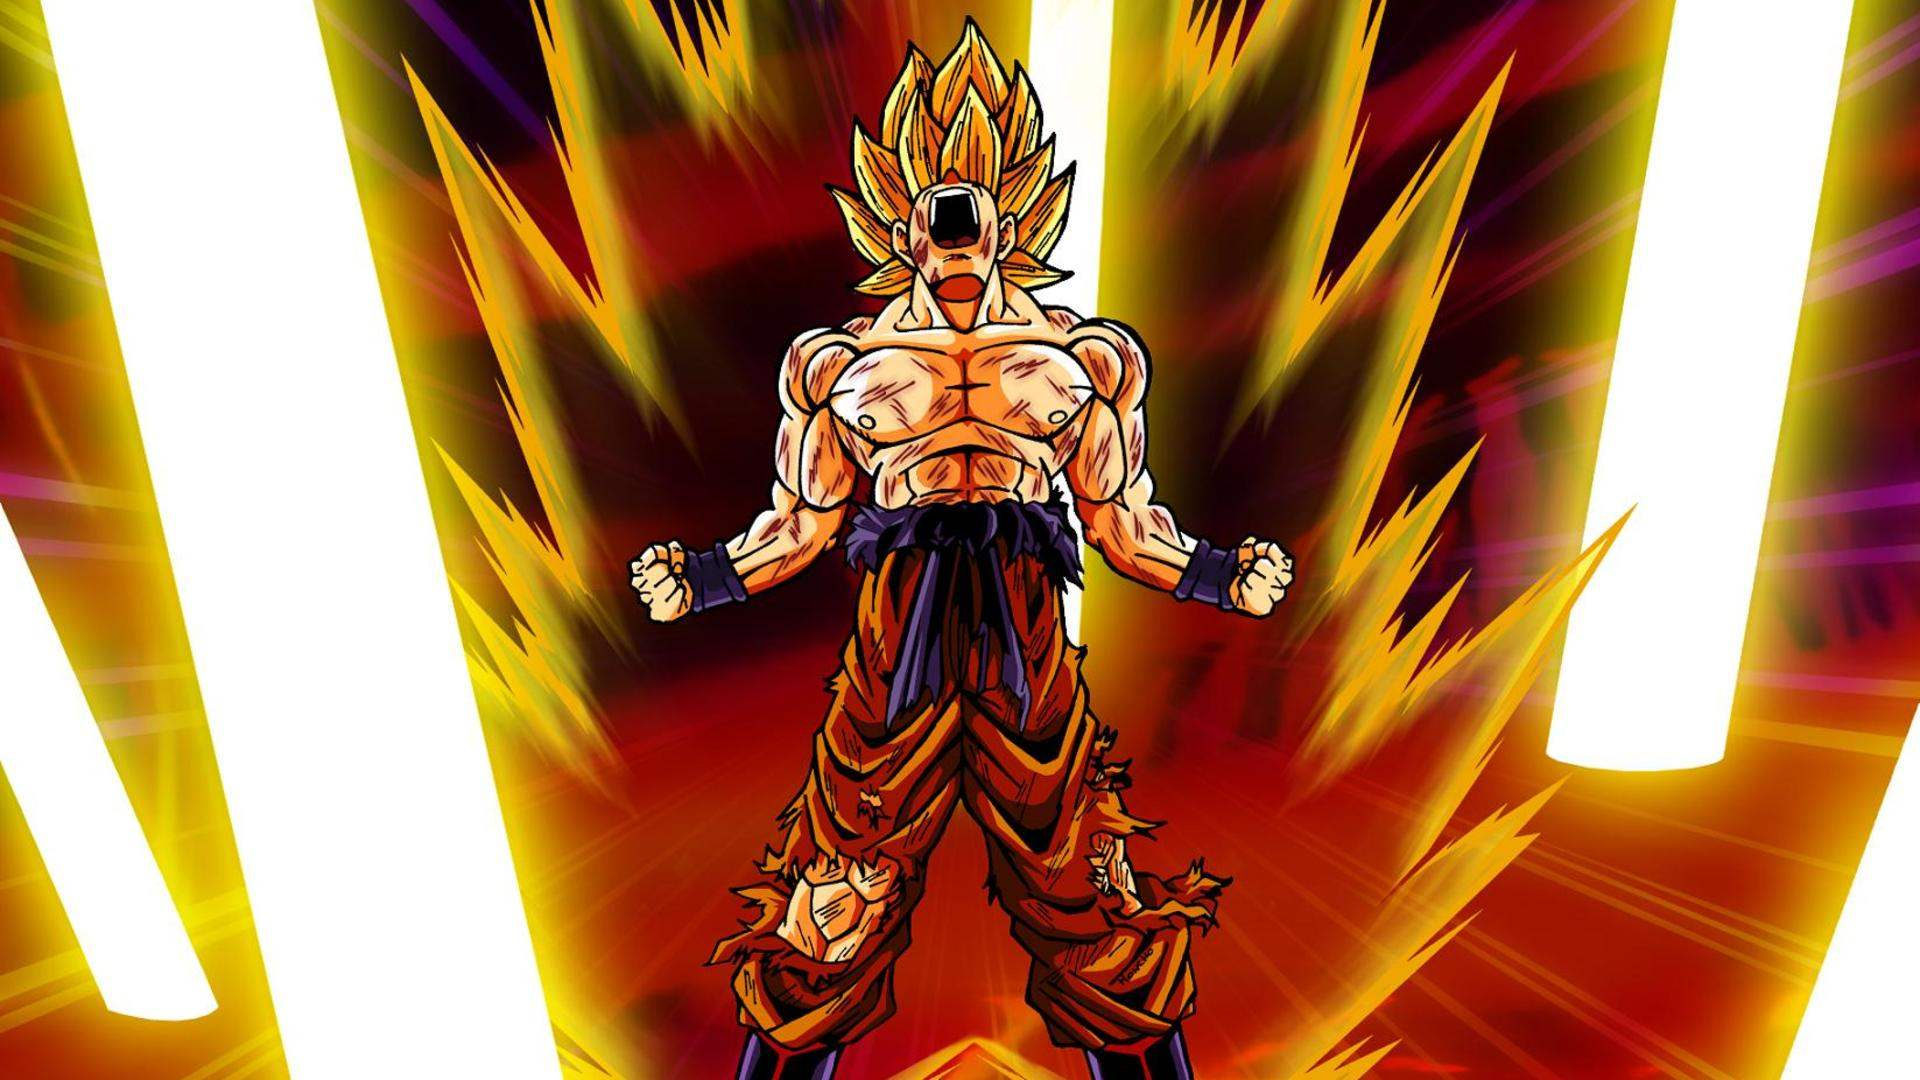 Free Download Dragon Ball Z Wallpapers Goku Super Saiyan 10 5